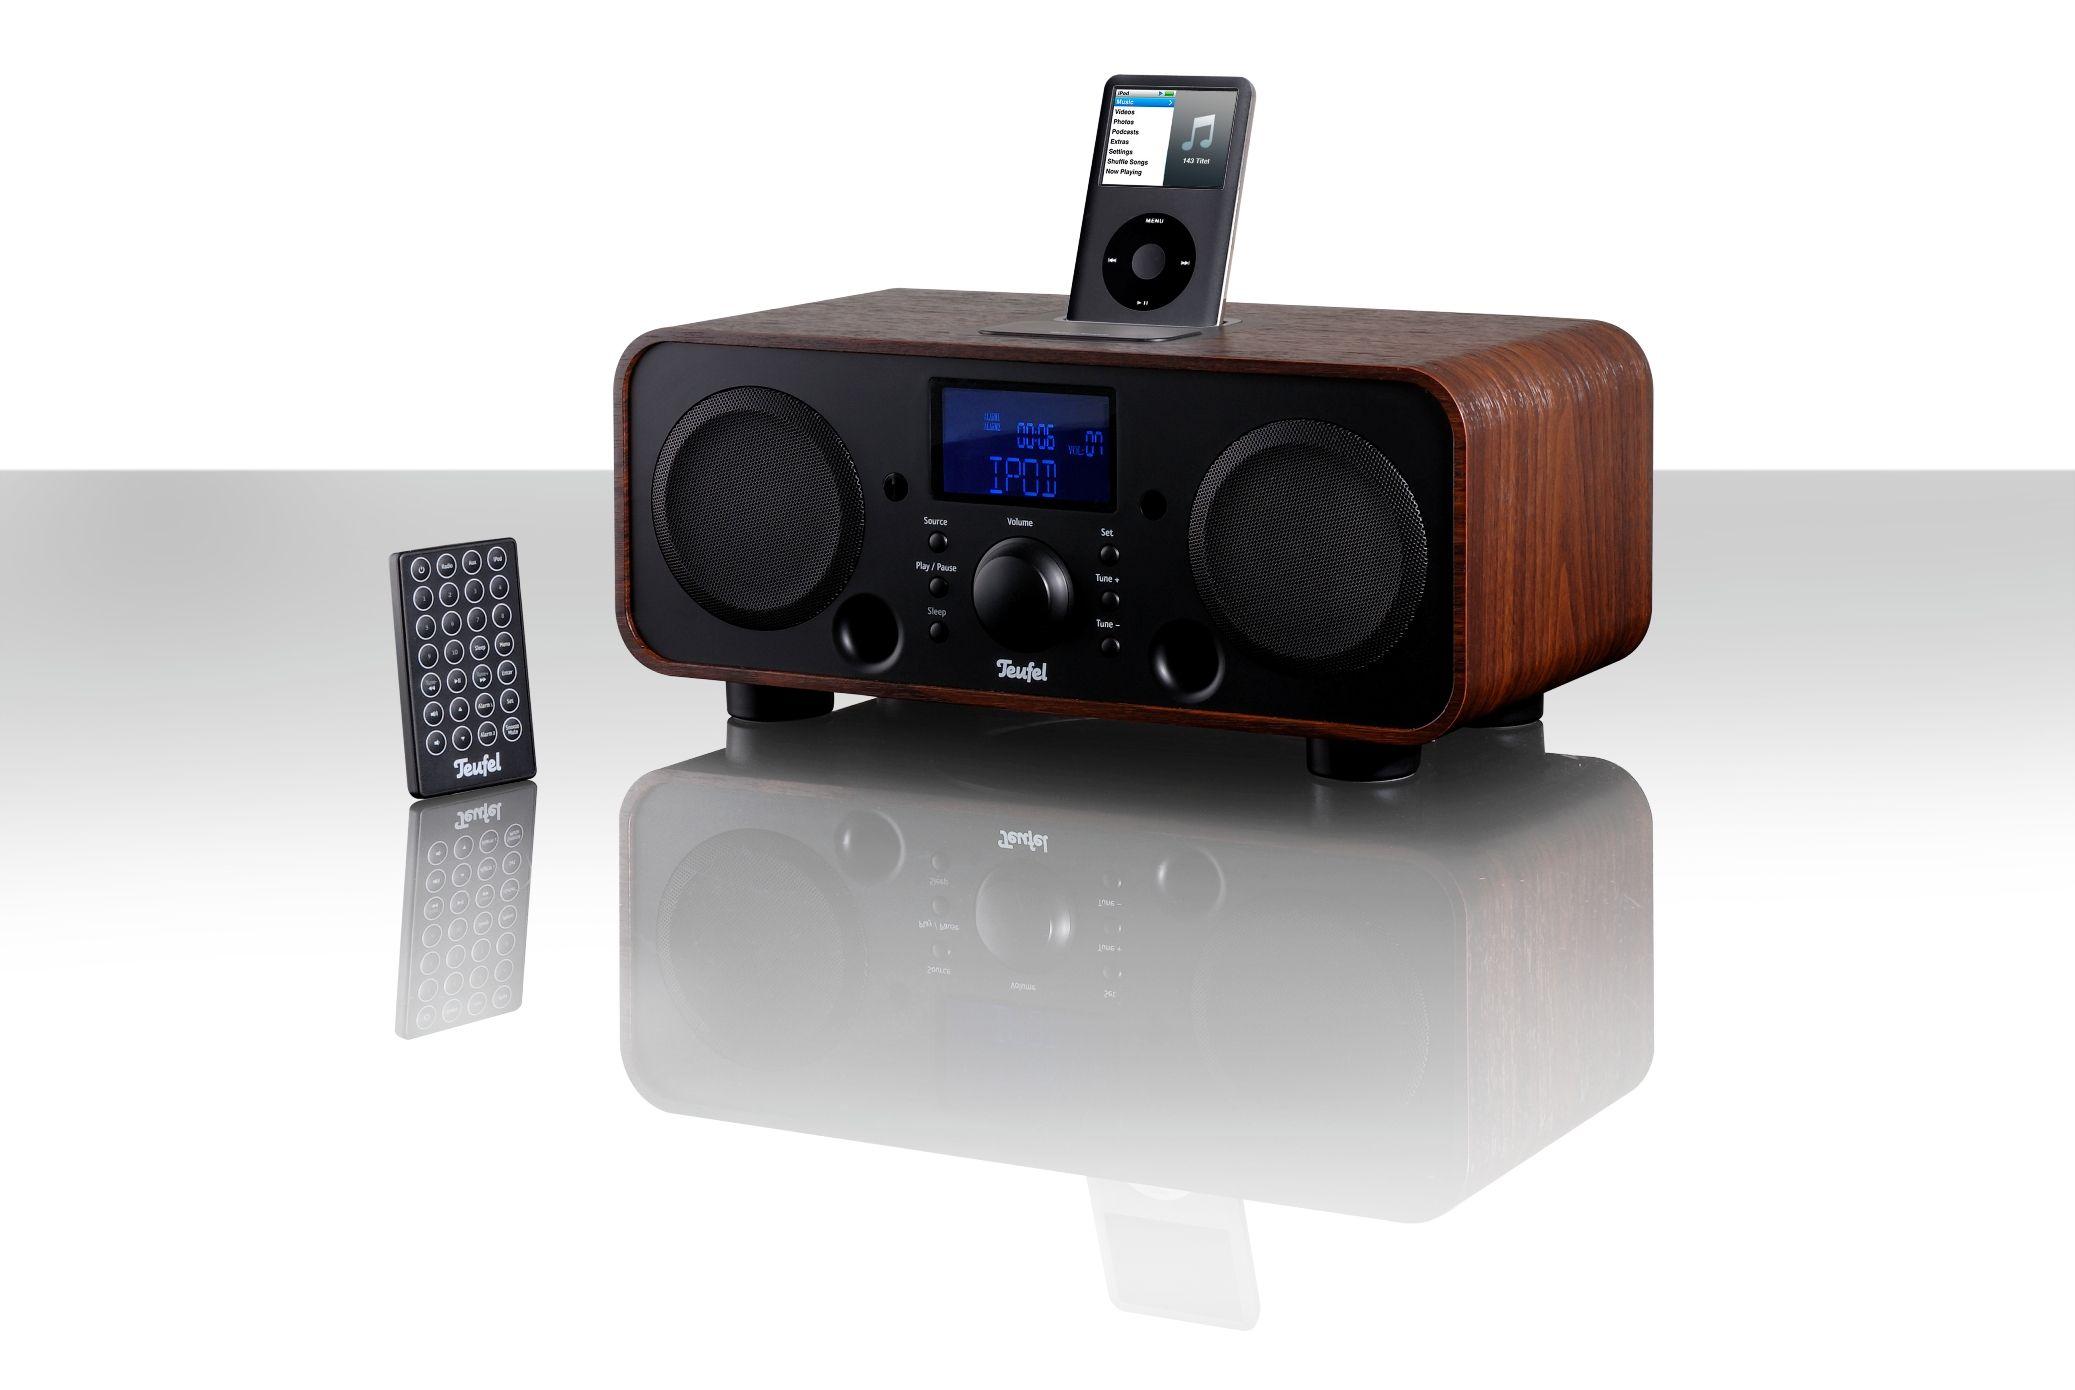 teufel ipod dock alarm clock radio tech digest. Black Bedroom Furniture Sets. Home Design Ideas